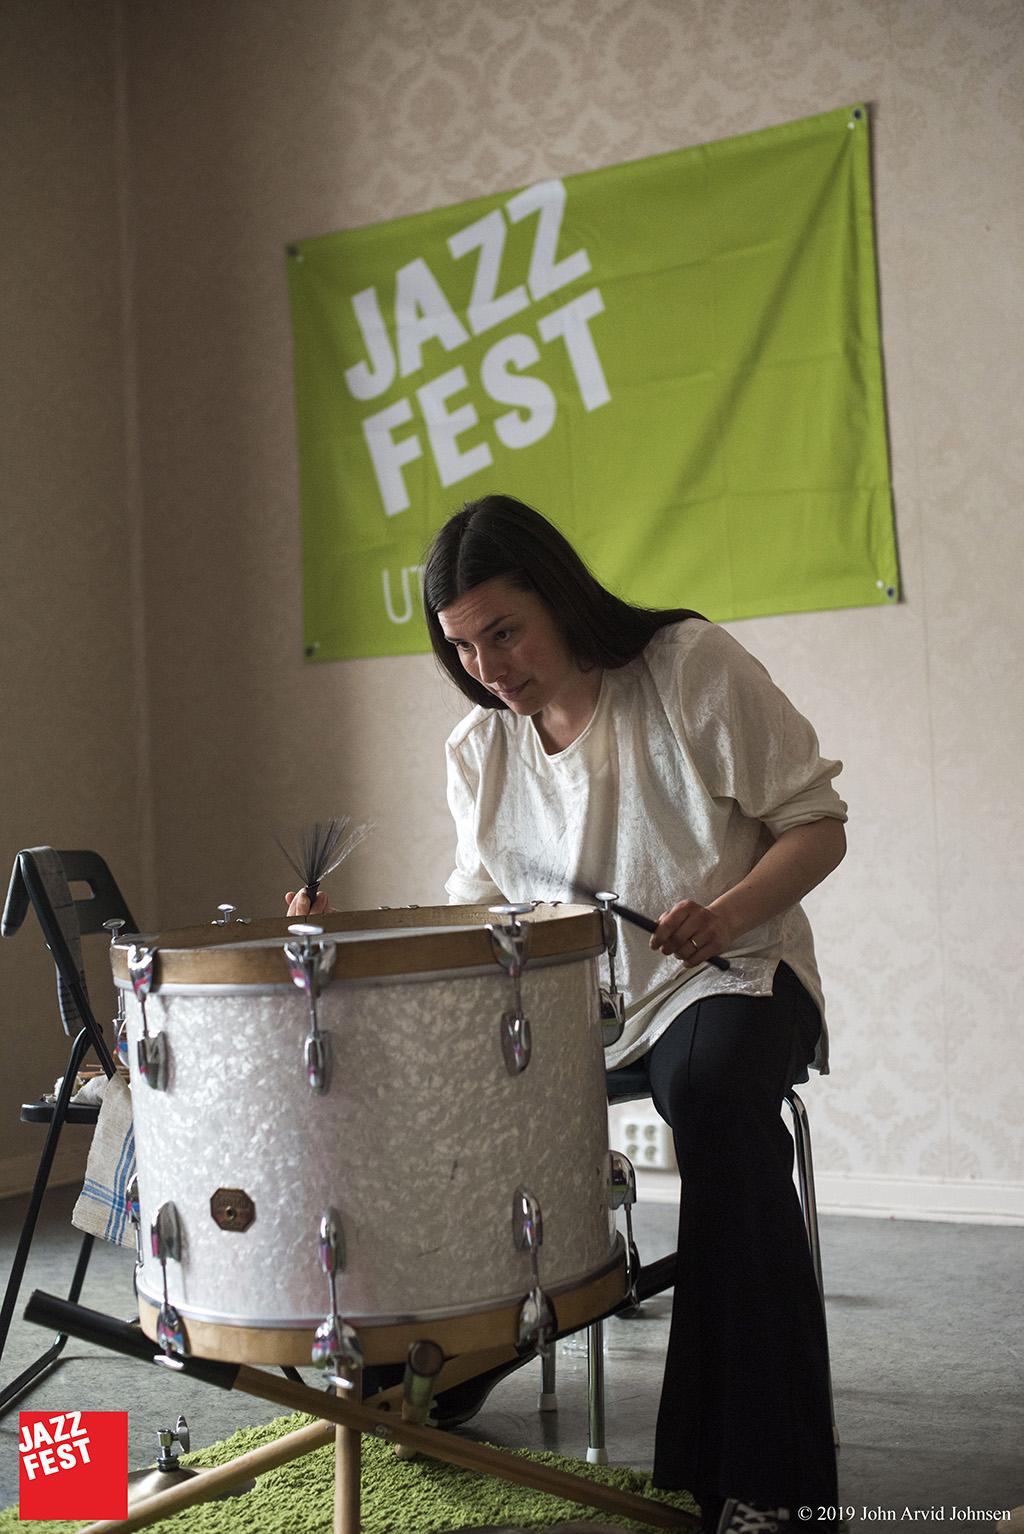 190511 Jazzfest Ung @ Isak Kultursenter (foto John Arvid Johnsen) _ 7.jpg